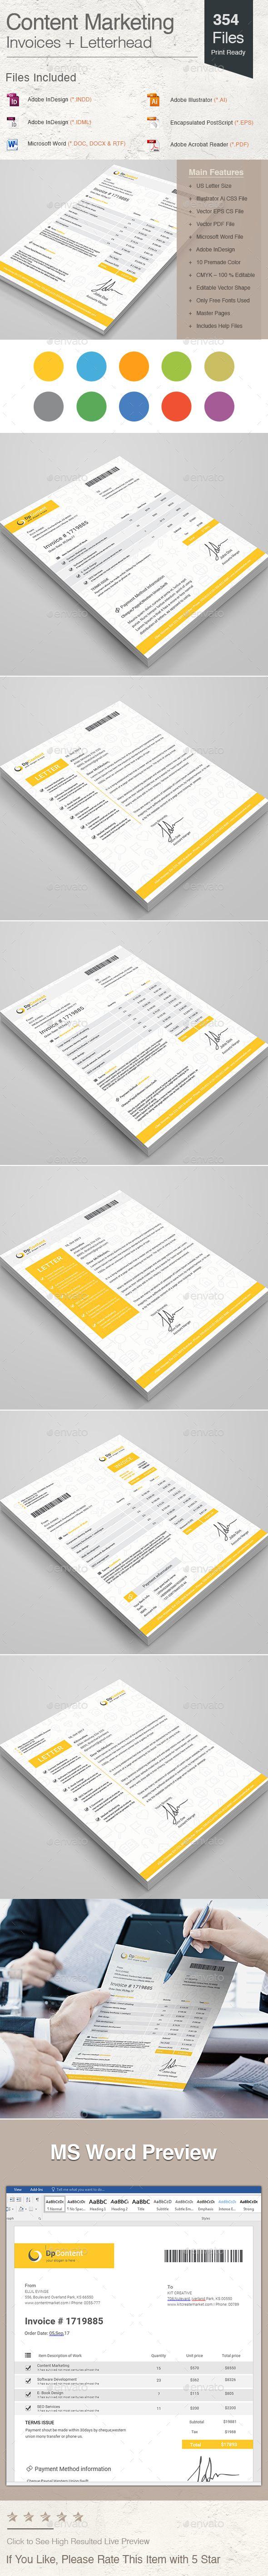 Content Marketing Invoices + Letterhead Template Vector EPS ...